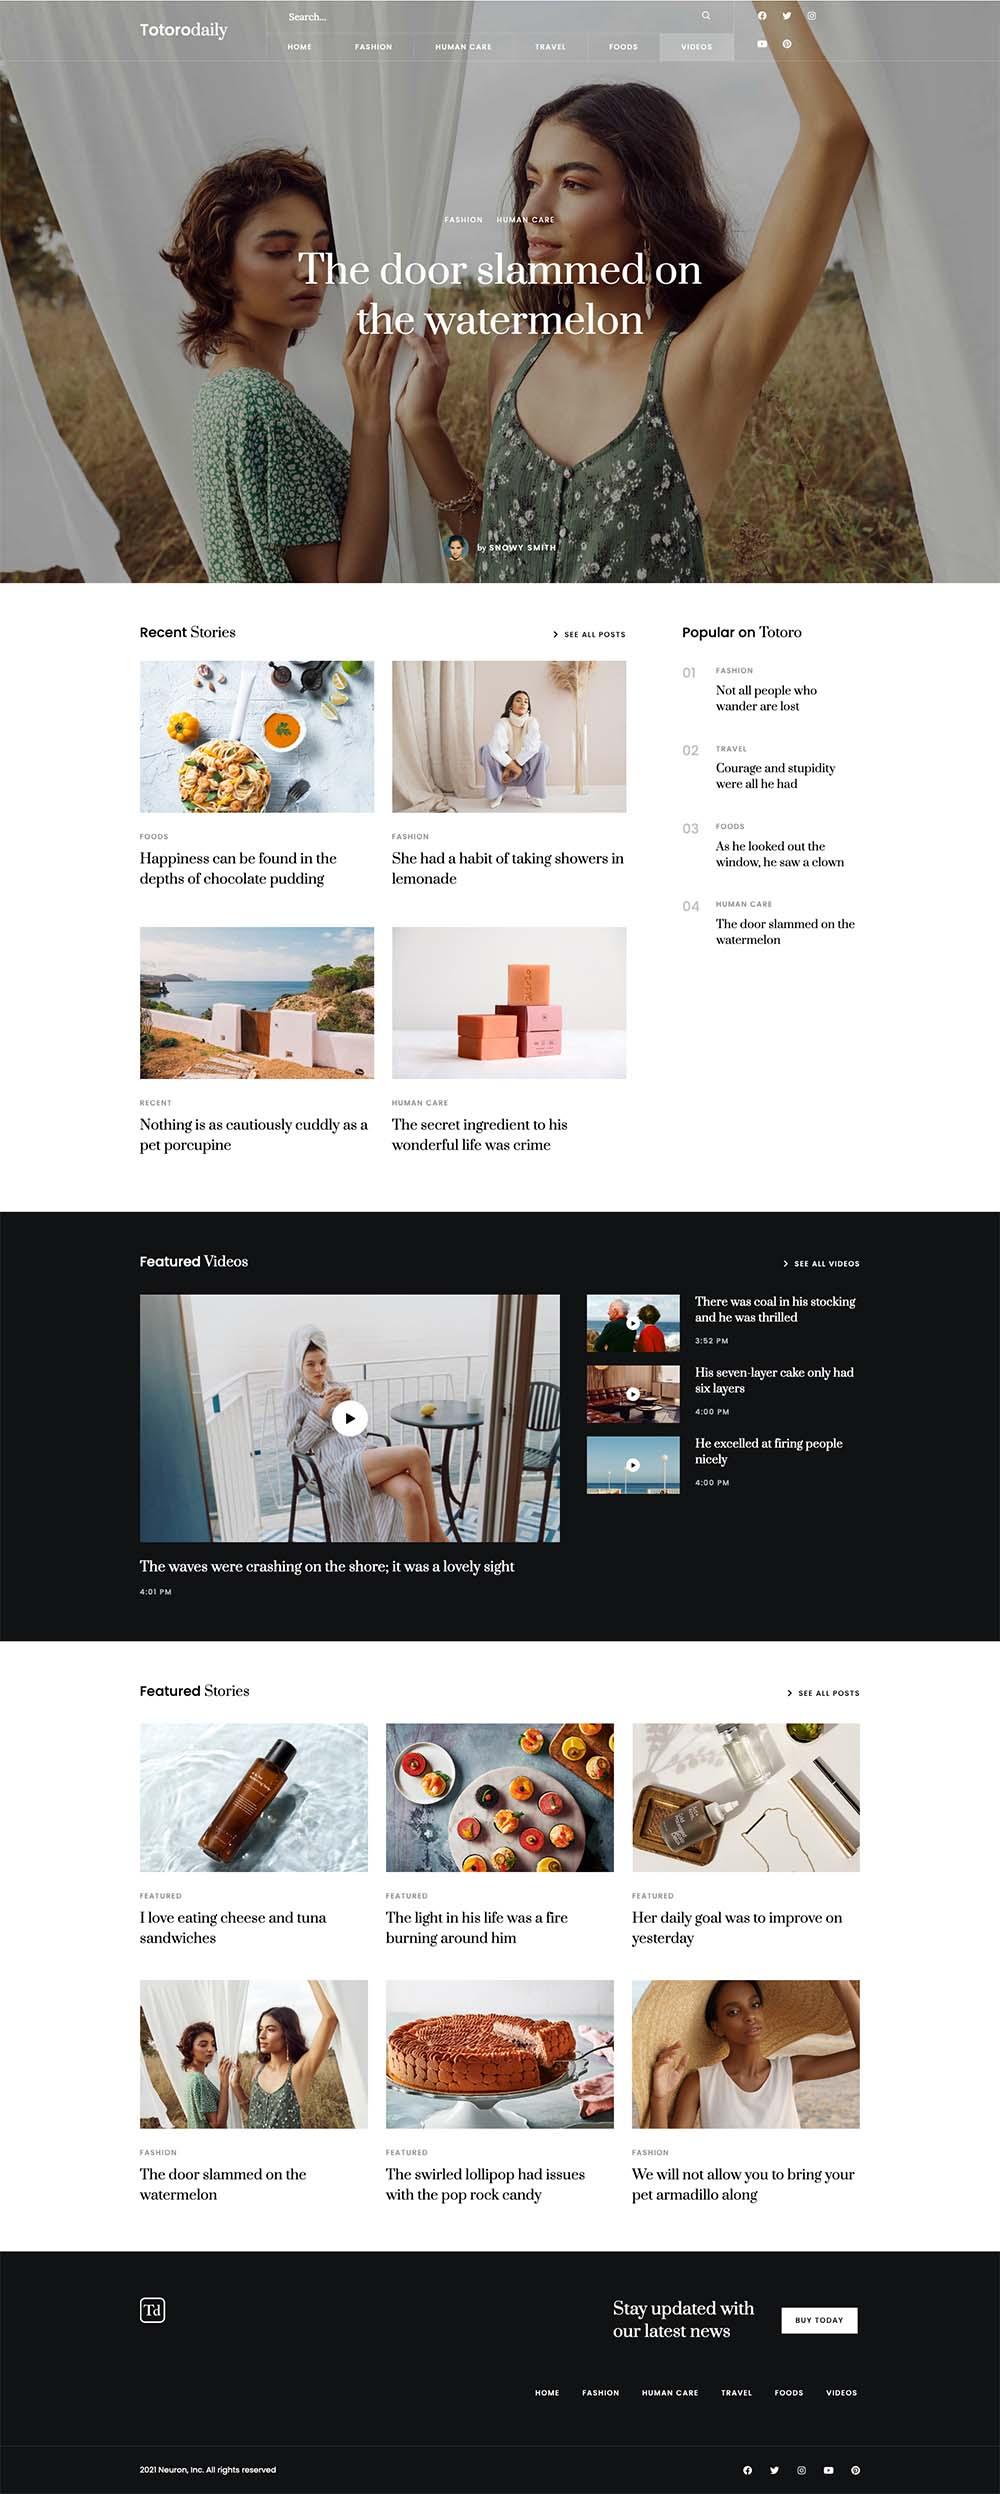 Totoro Blog and Magazine Demo Website for WordPress